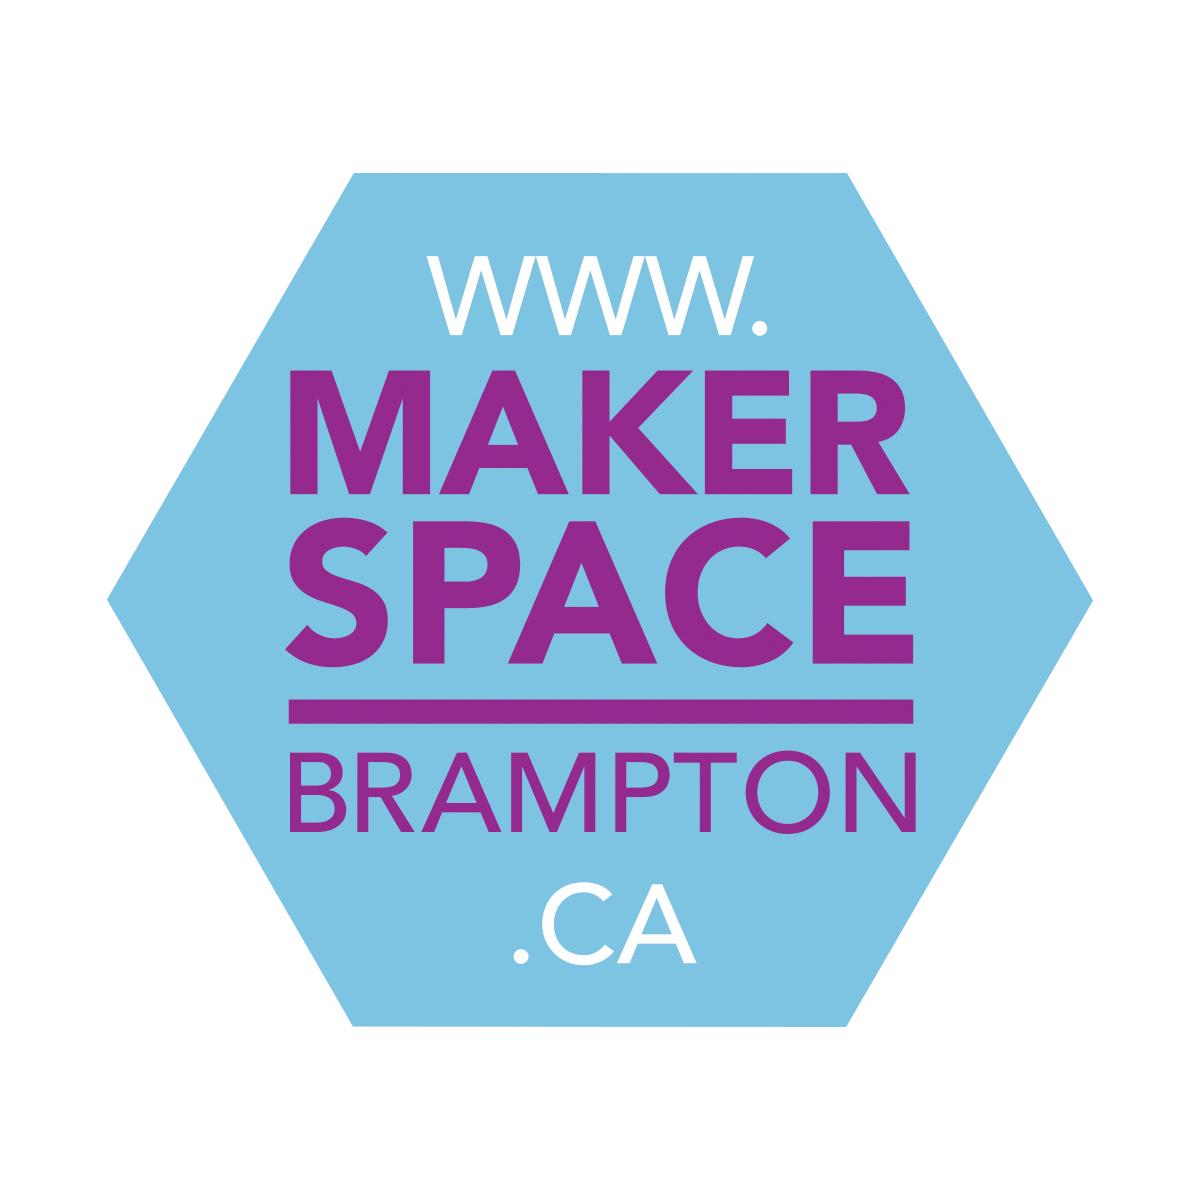 www.makerspacebrampton.ca